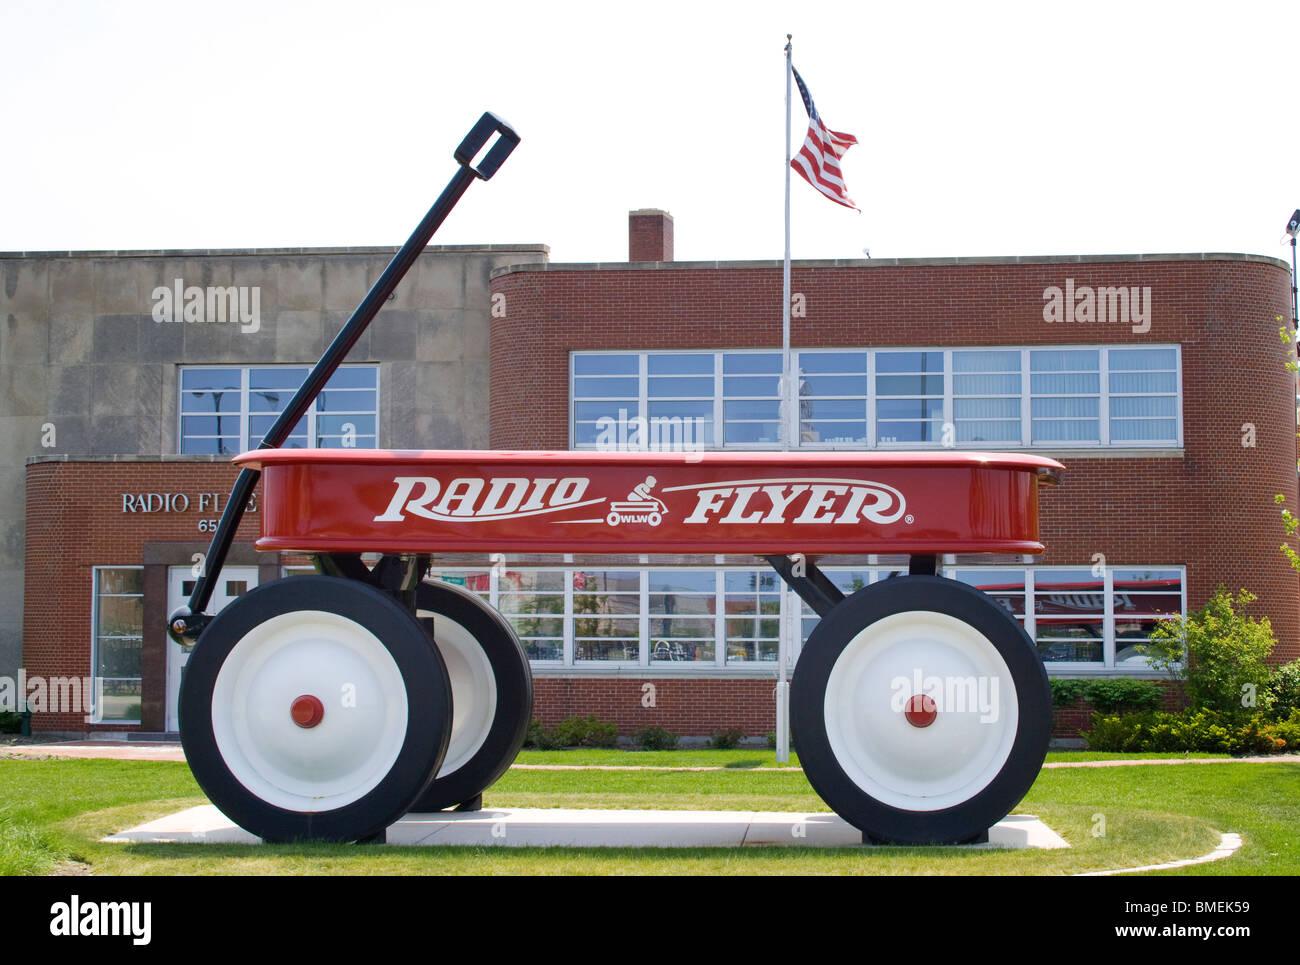 Giant Wagon at the Radio Flyer headquarters in Elmwood Park Illinois - Stock Image